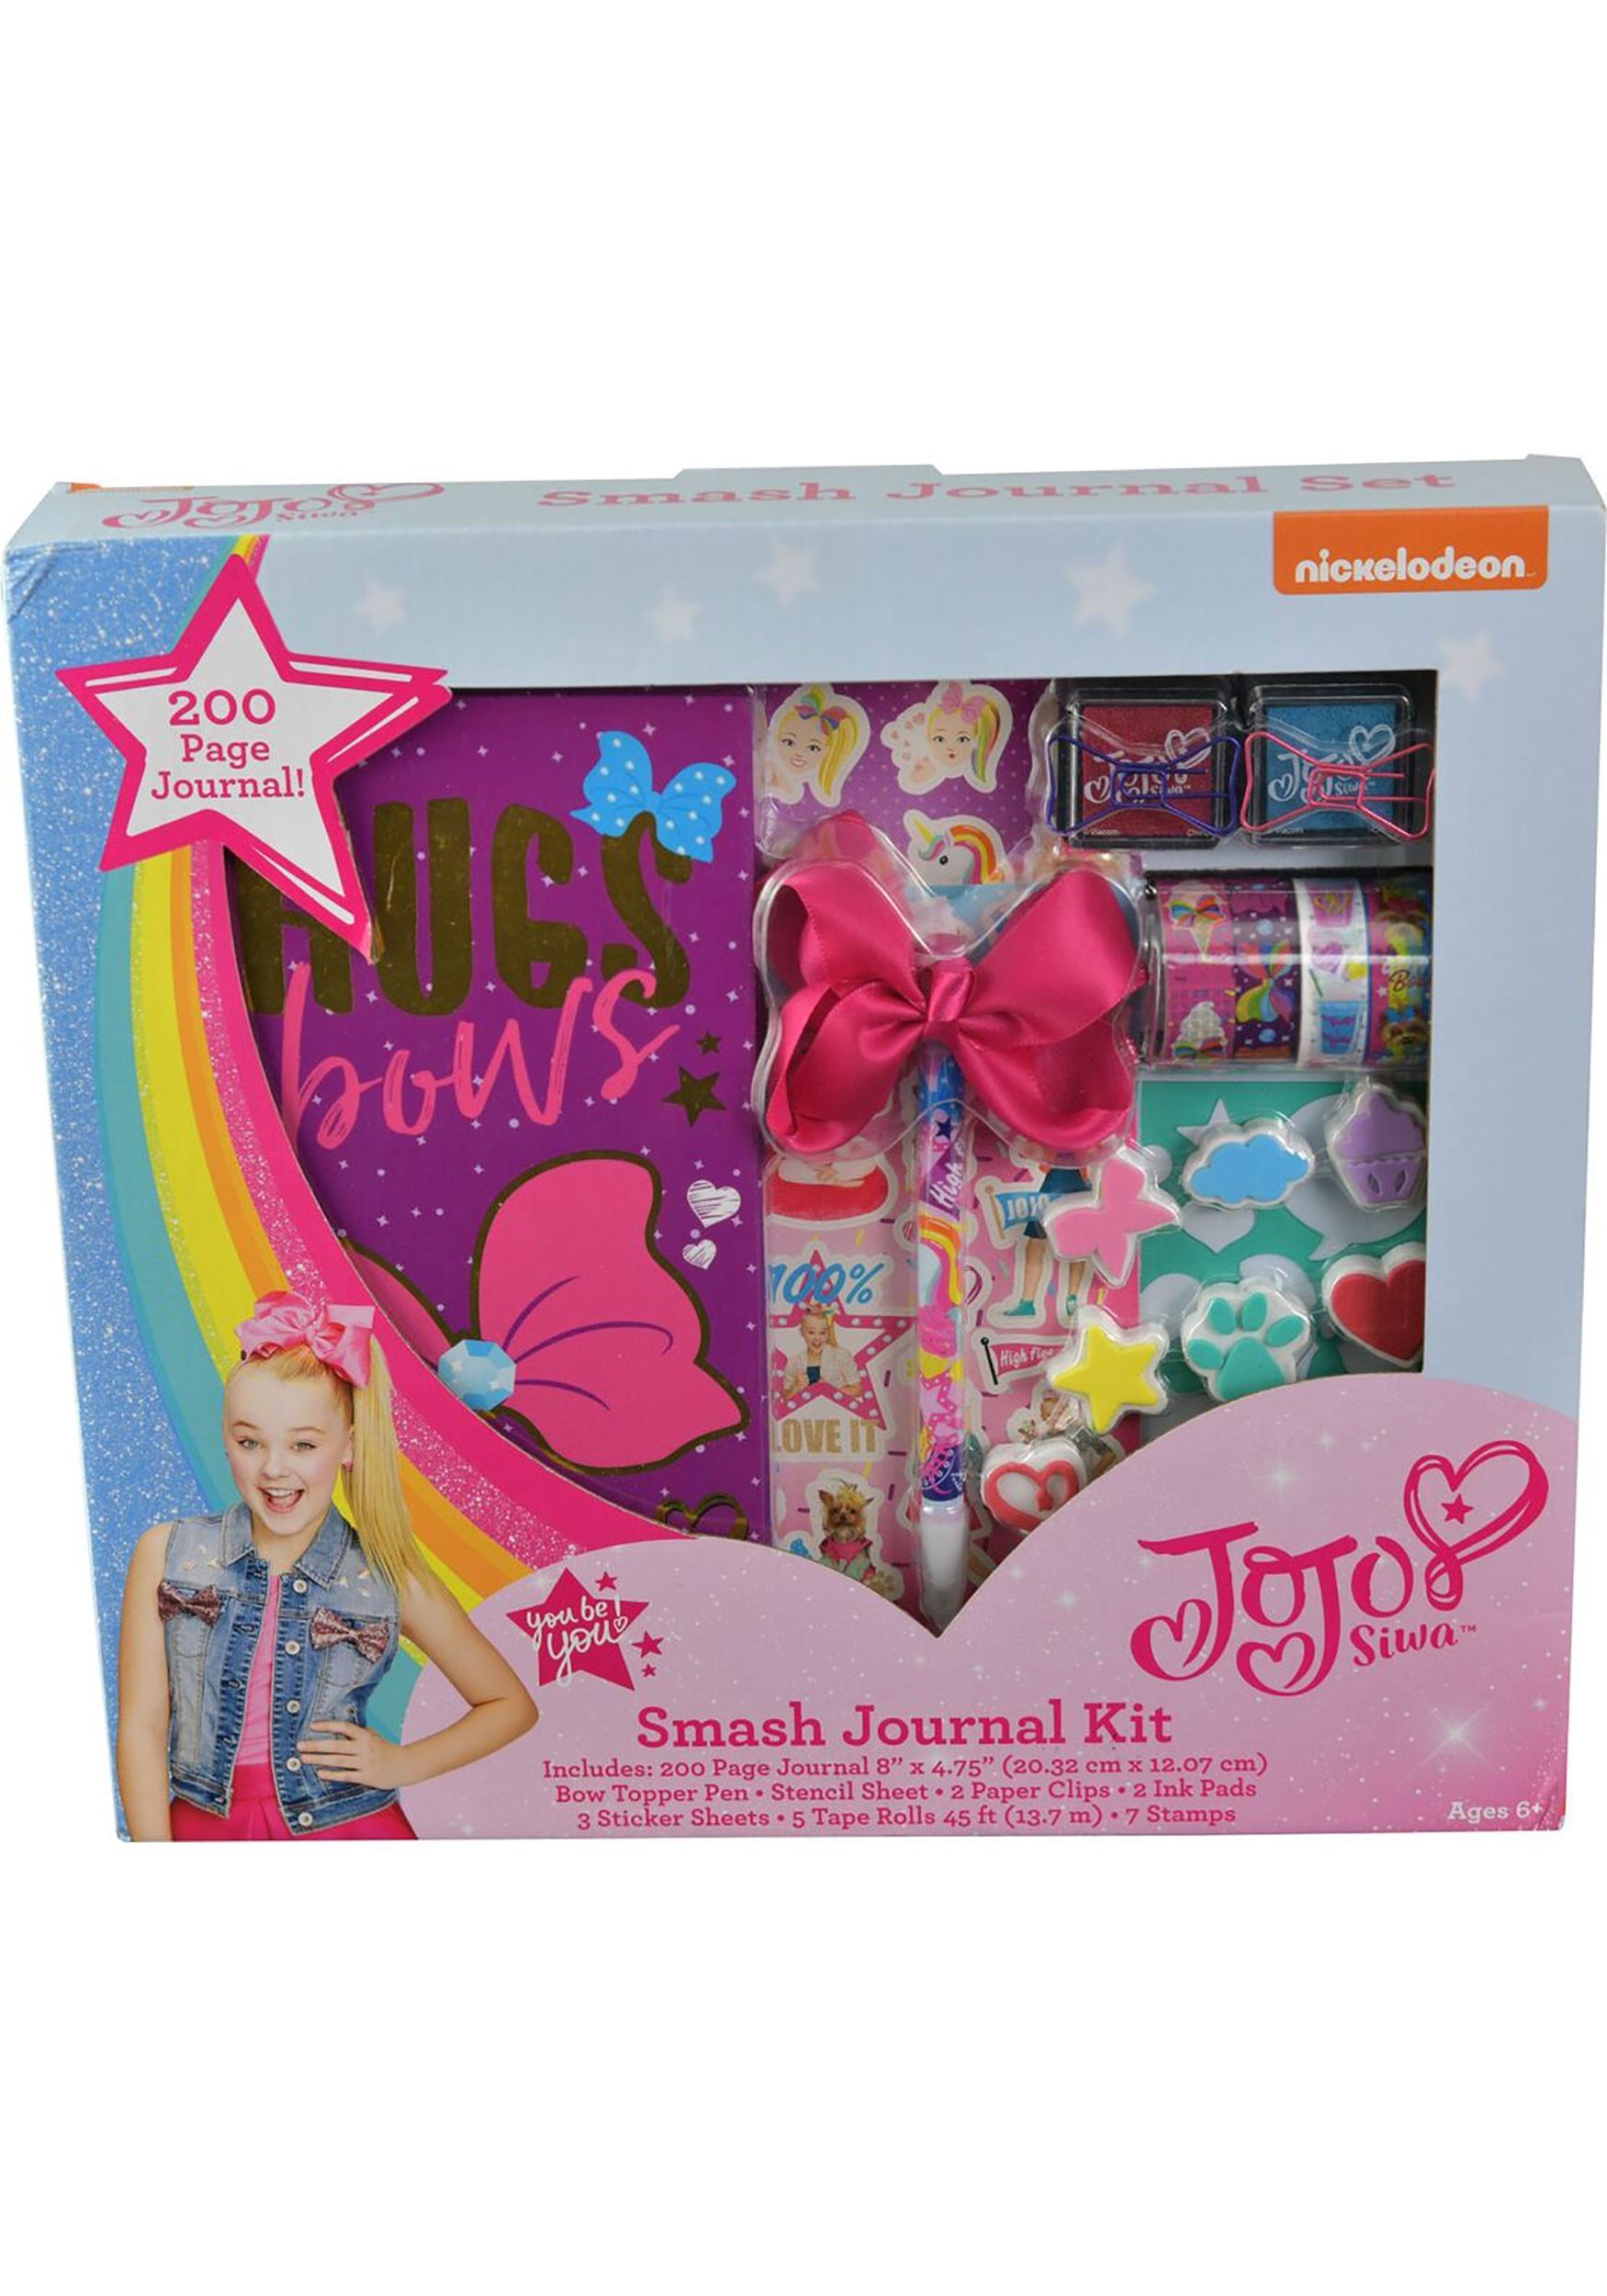 Kids JoJo Siwa Smash Journal Set in Box